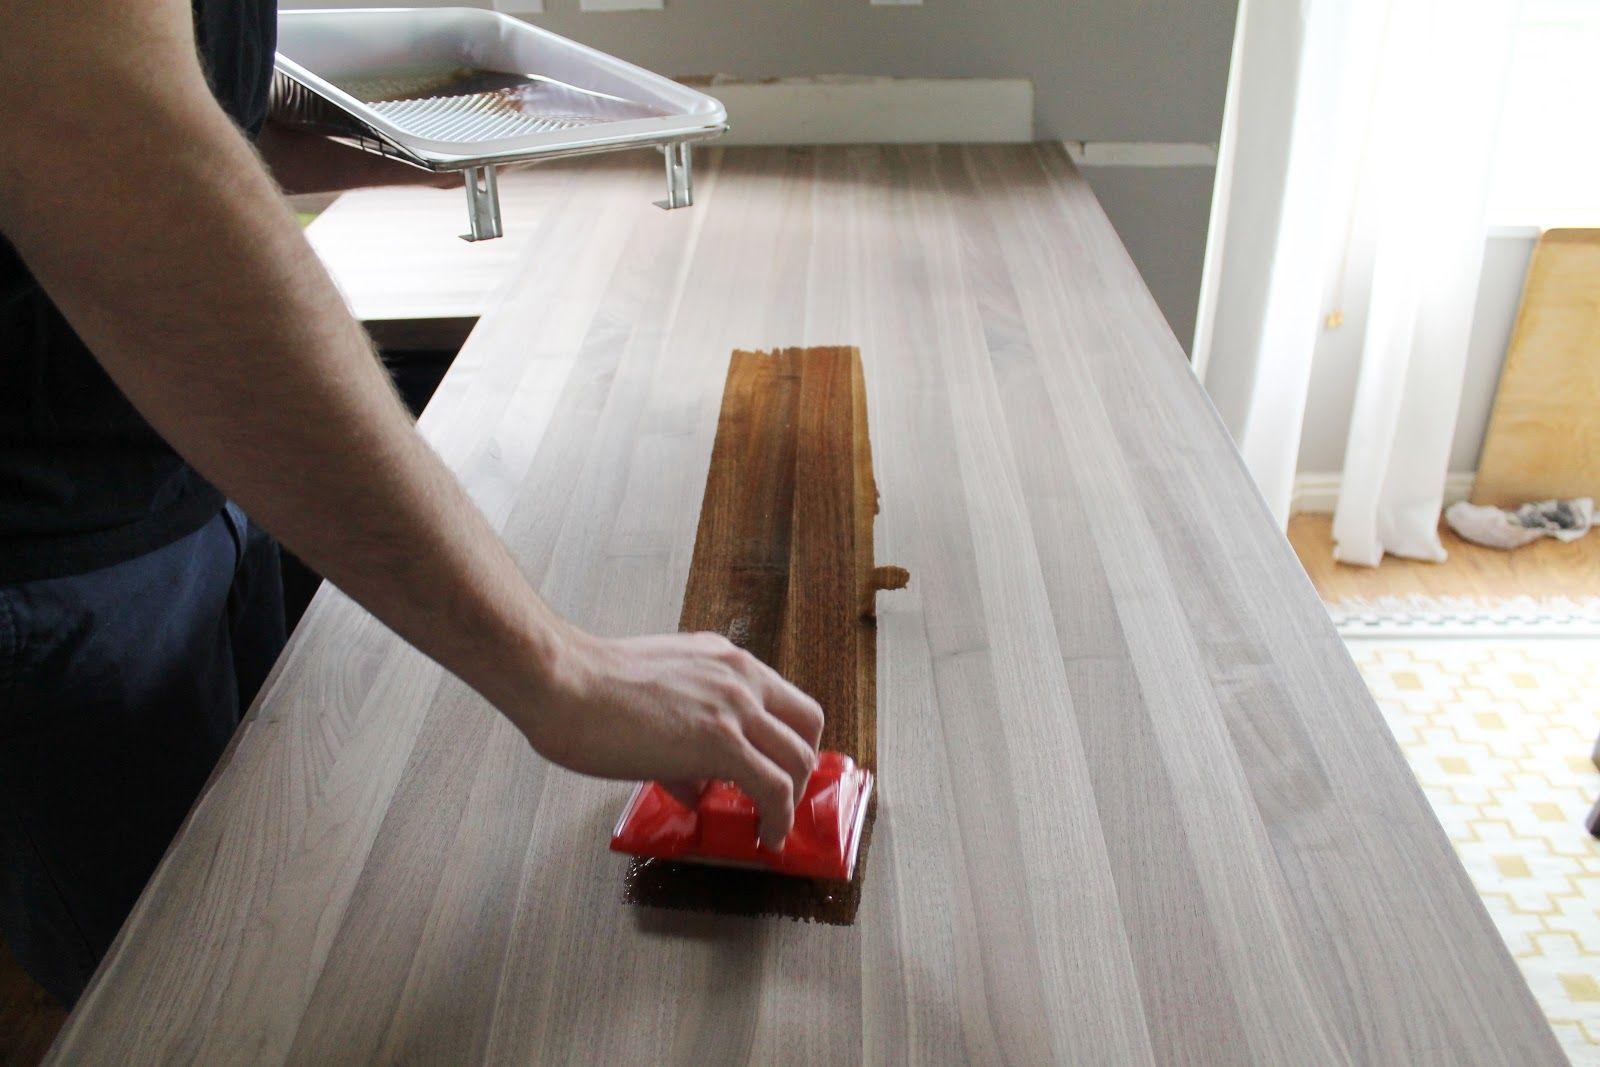 Best Sealer For Wood Kitchen Countertops   Diy wood ...